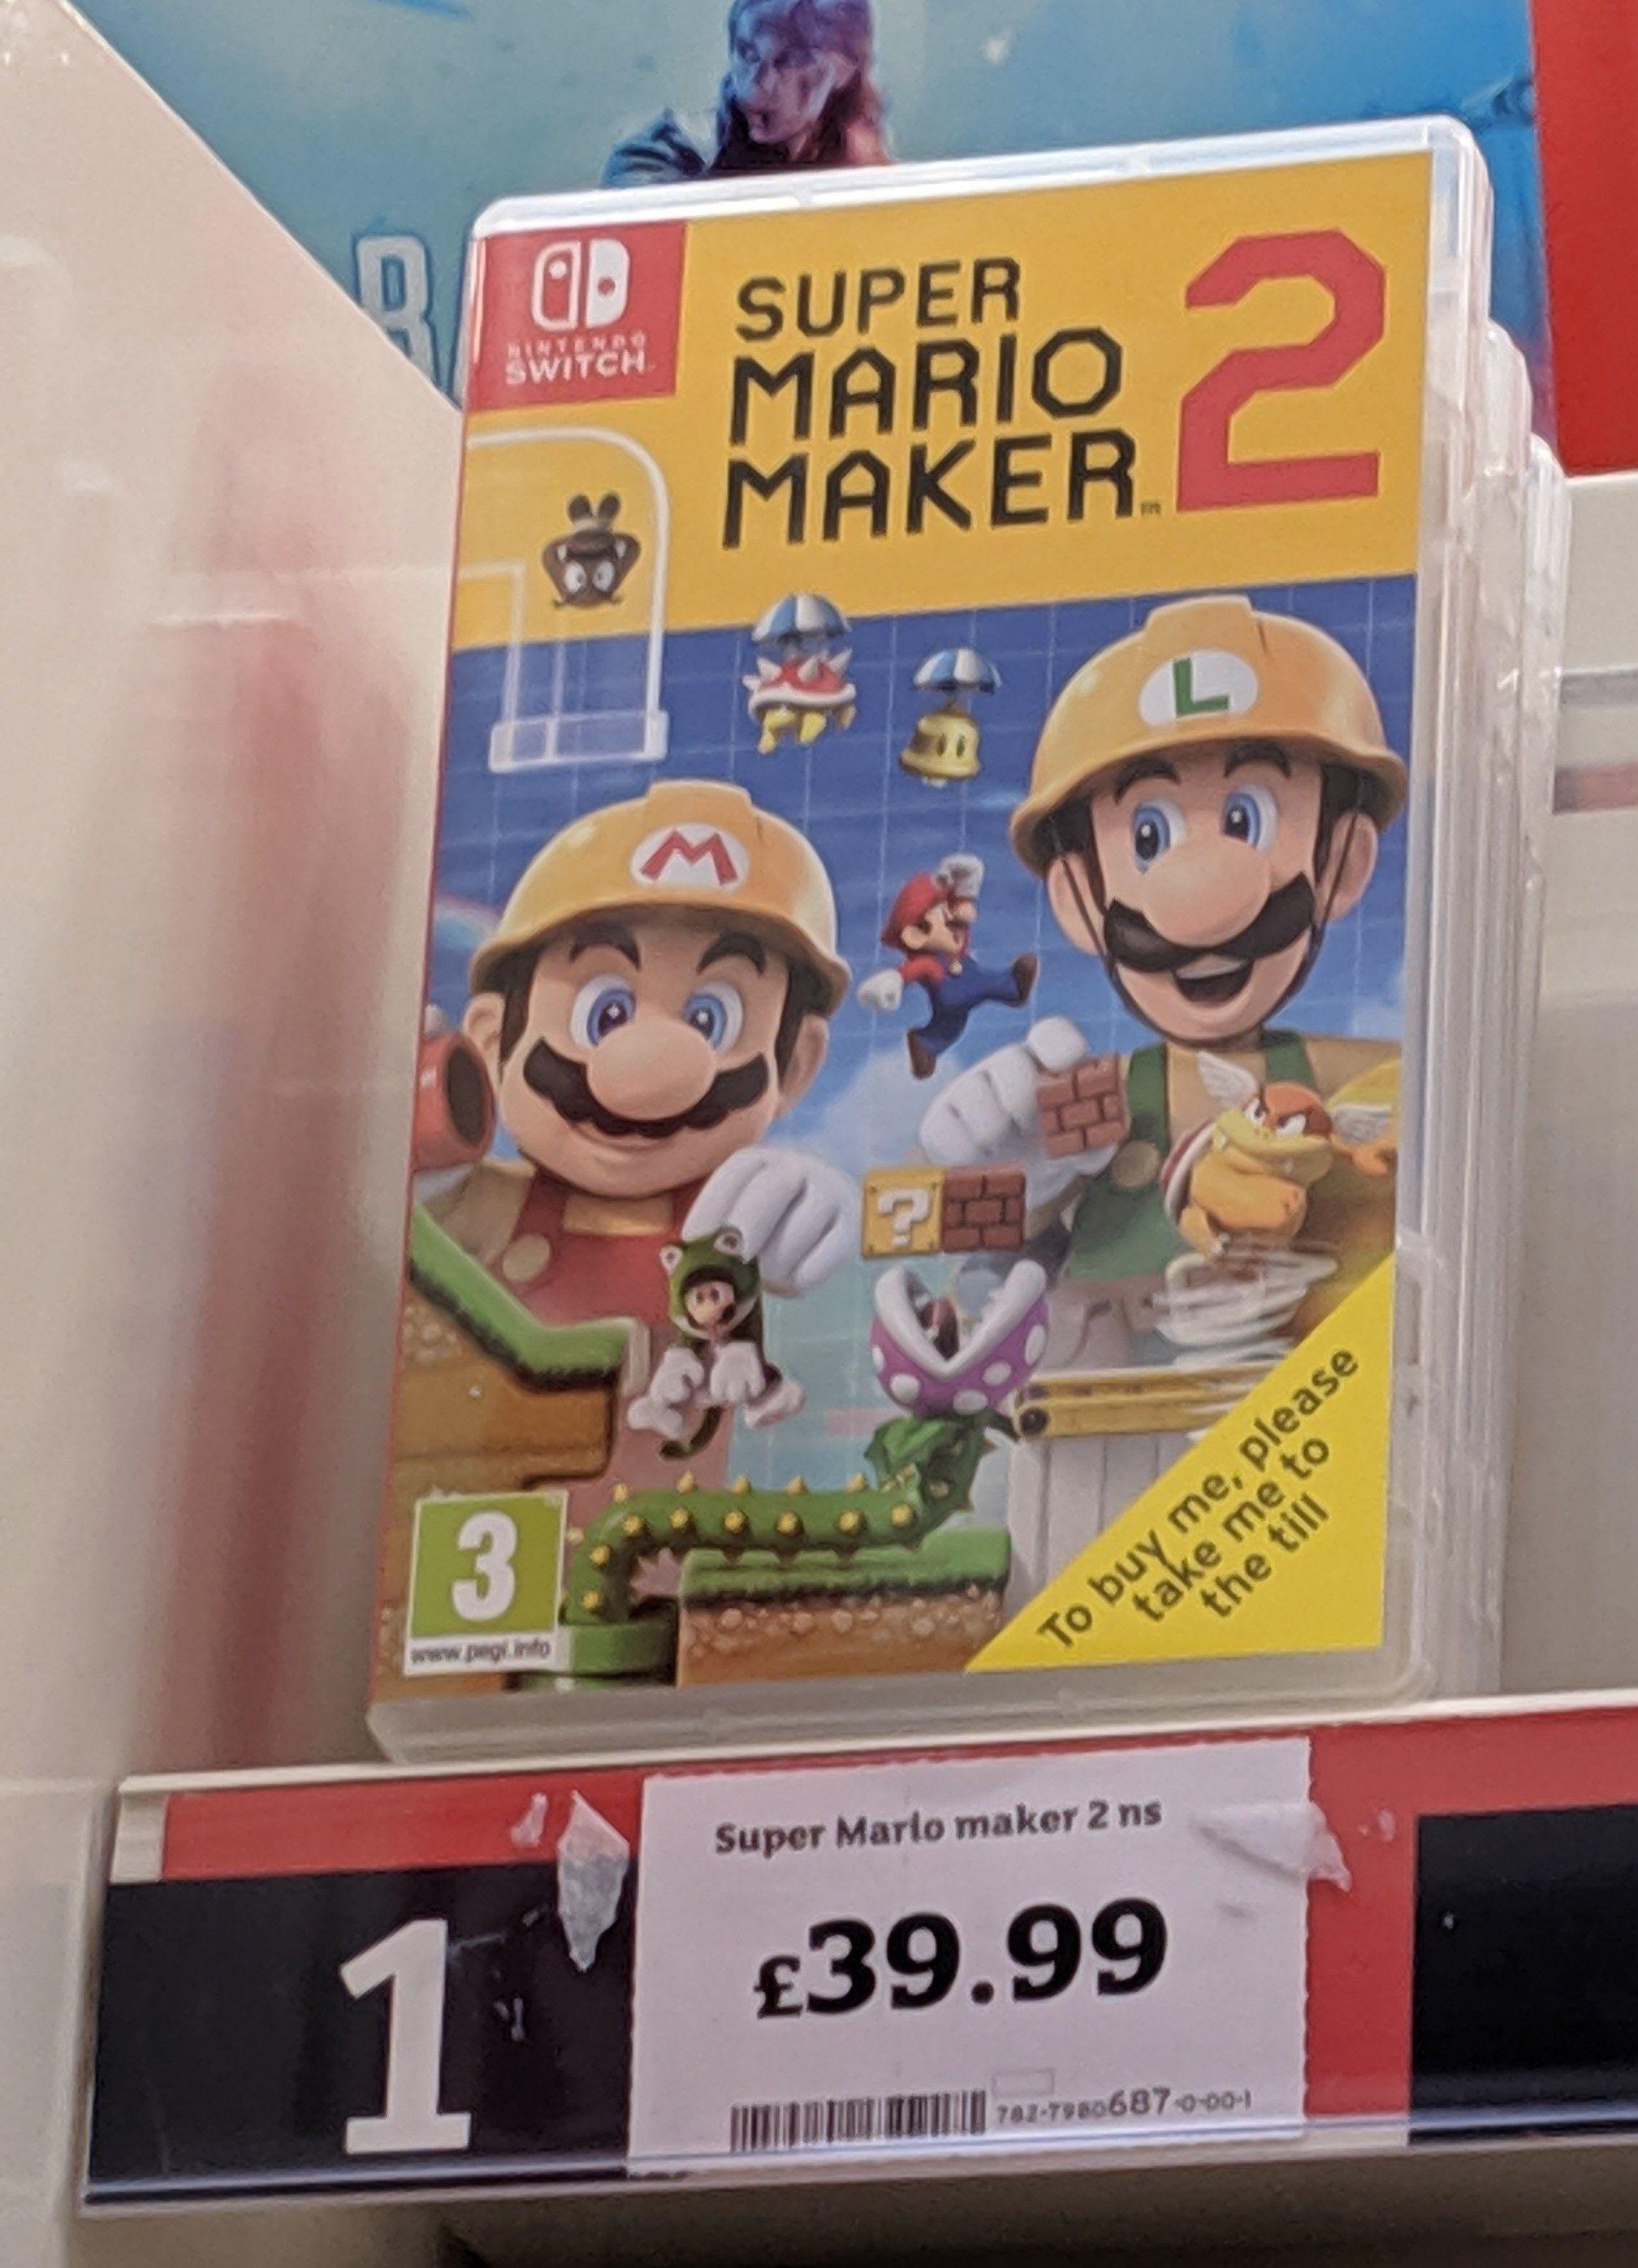 Super Mario Maker 2 - £39.99 @ Sainsbury's instore